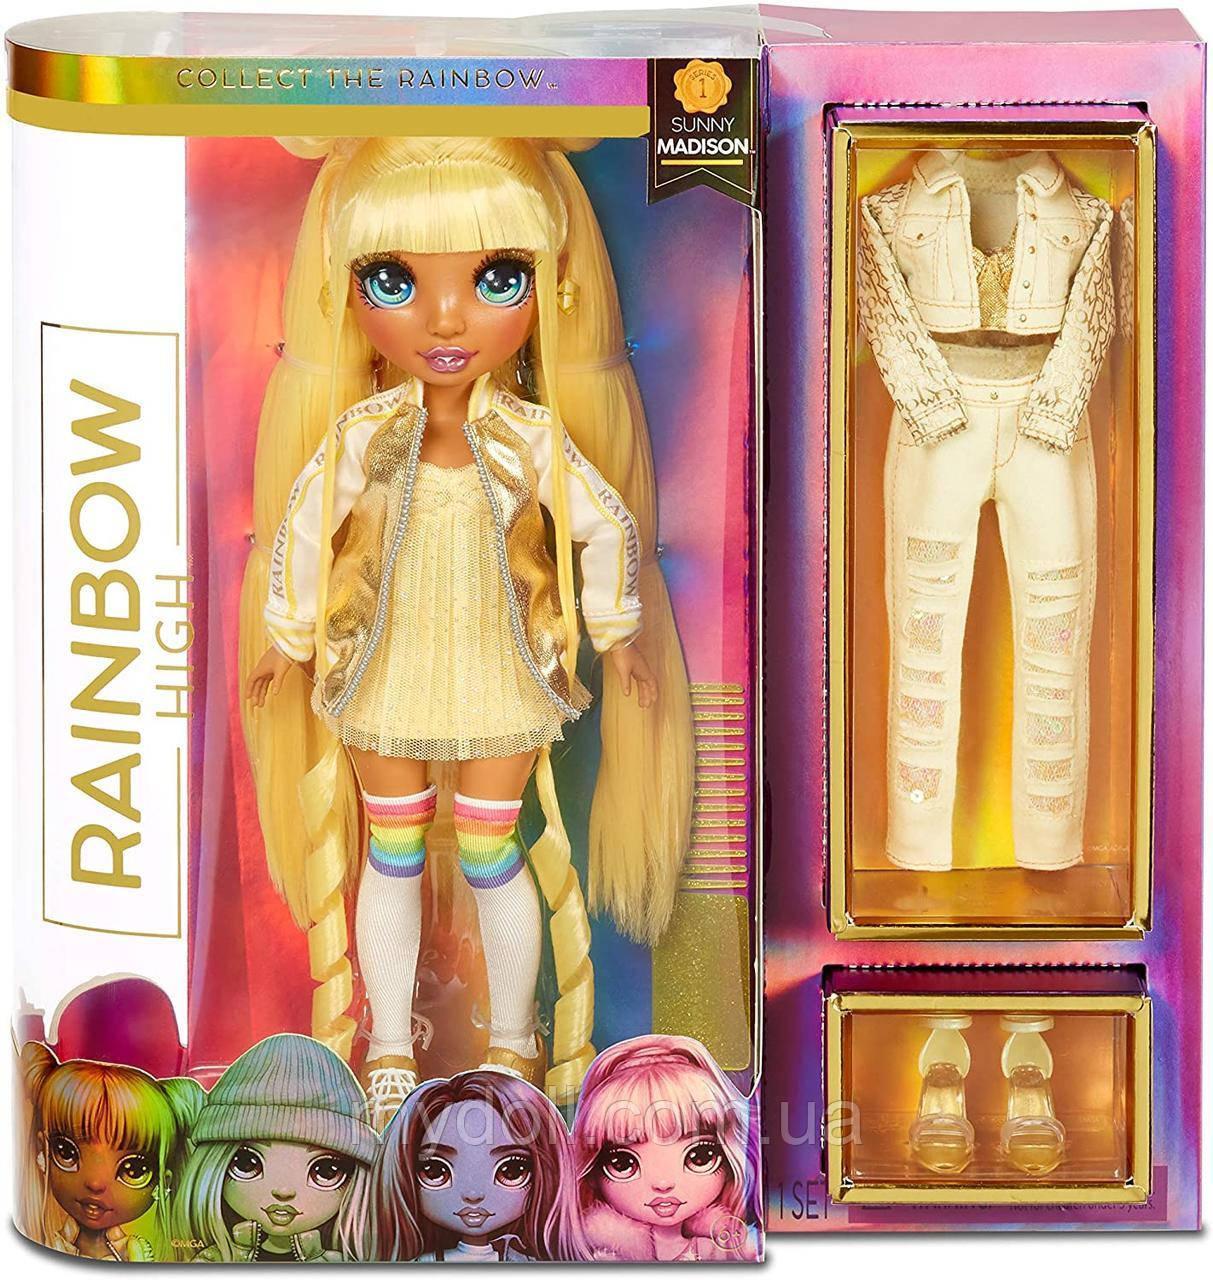 Кукла Rainbow High Санни Sunny Madison Yellow Clothes Желтая Рейнбоу Хай Санни Медисон 569626 Оригинал